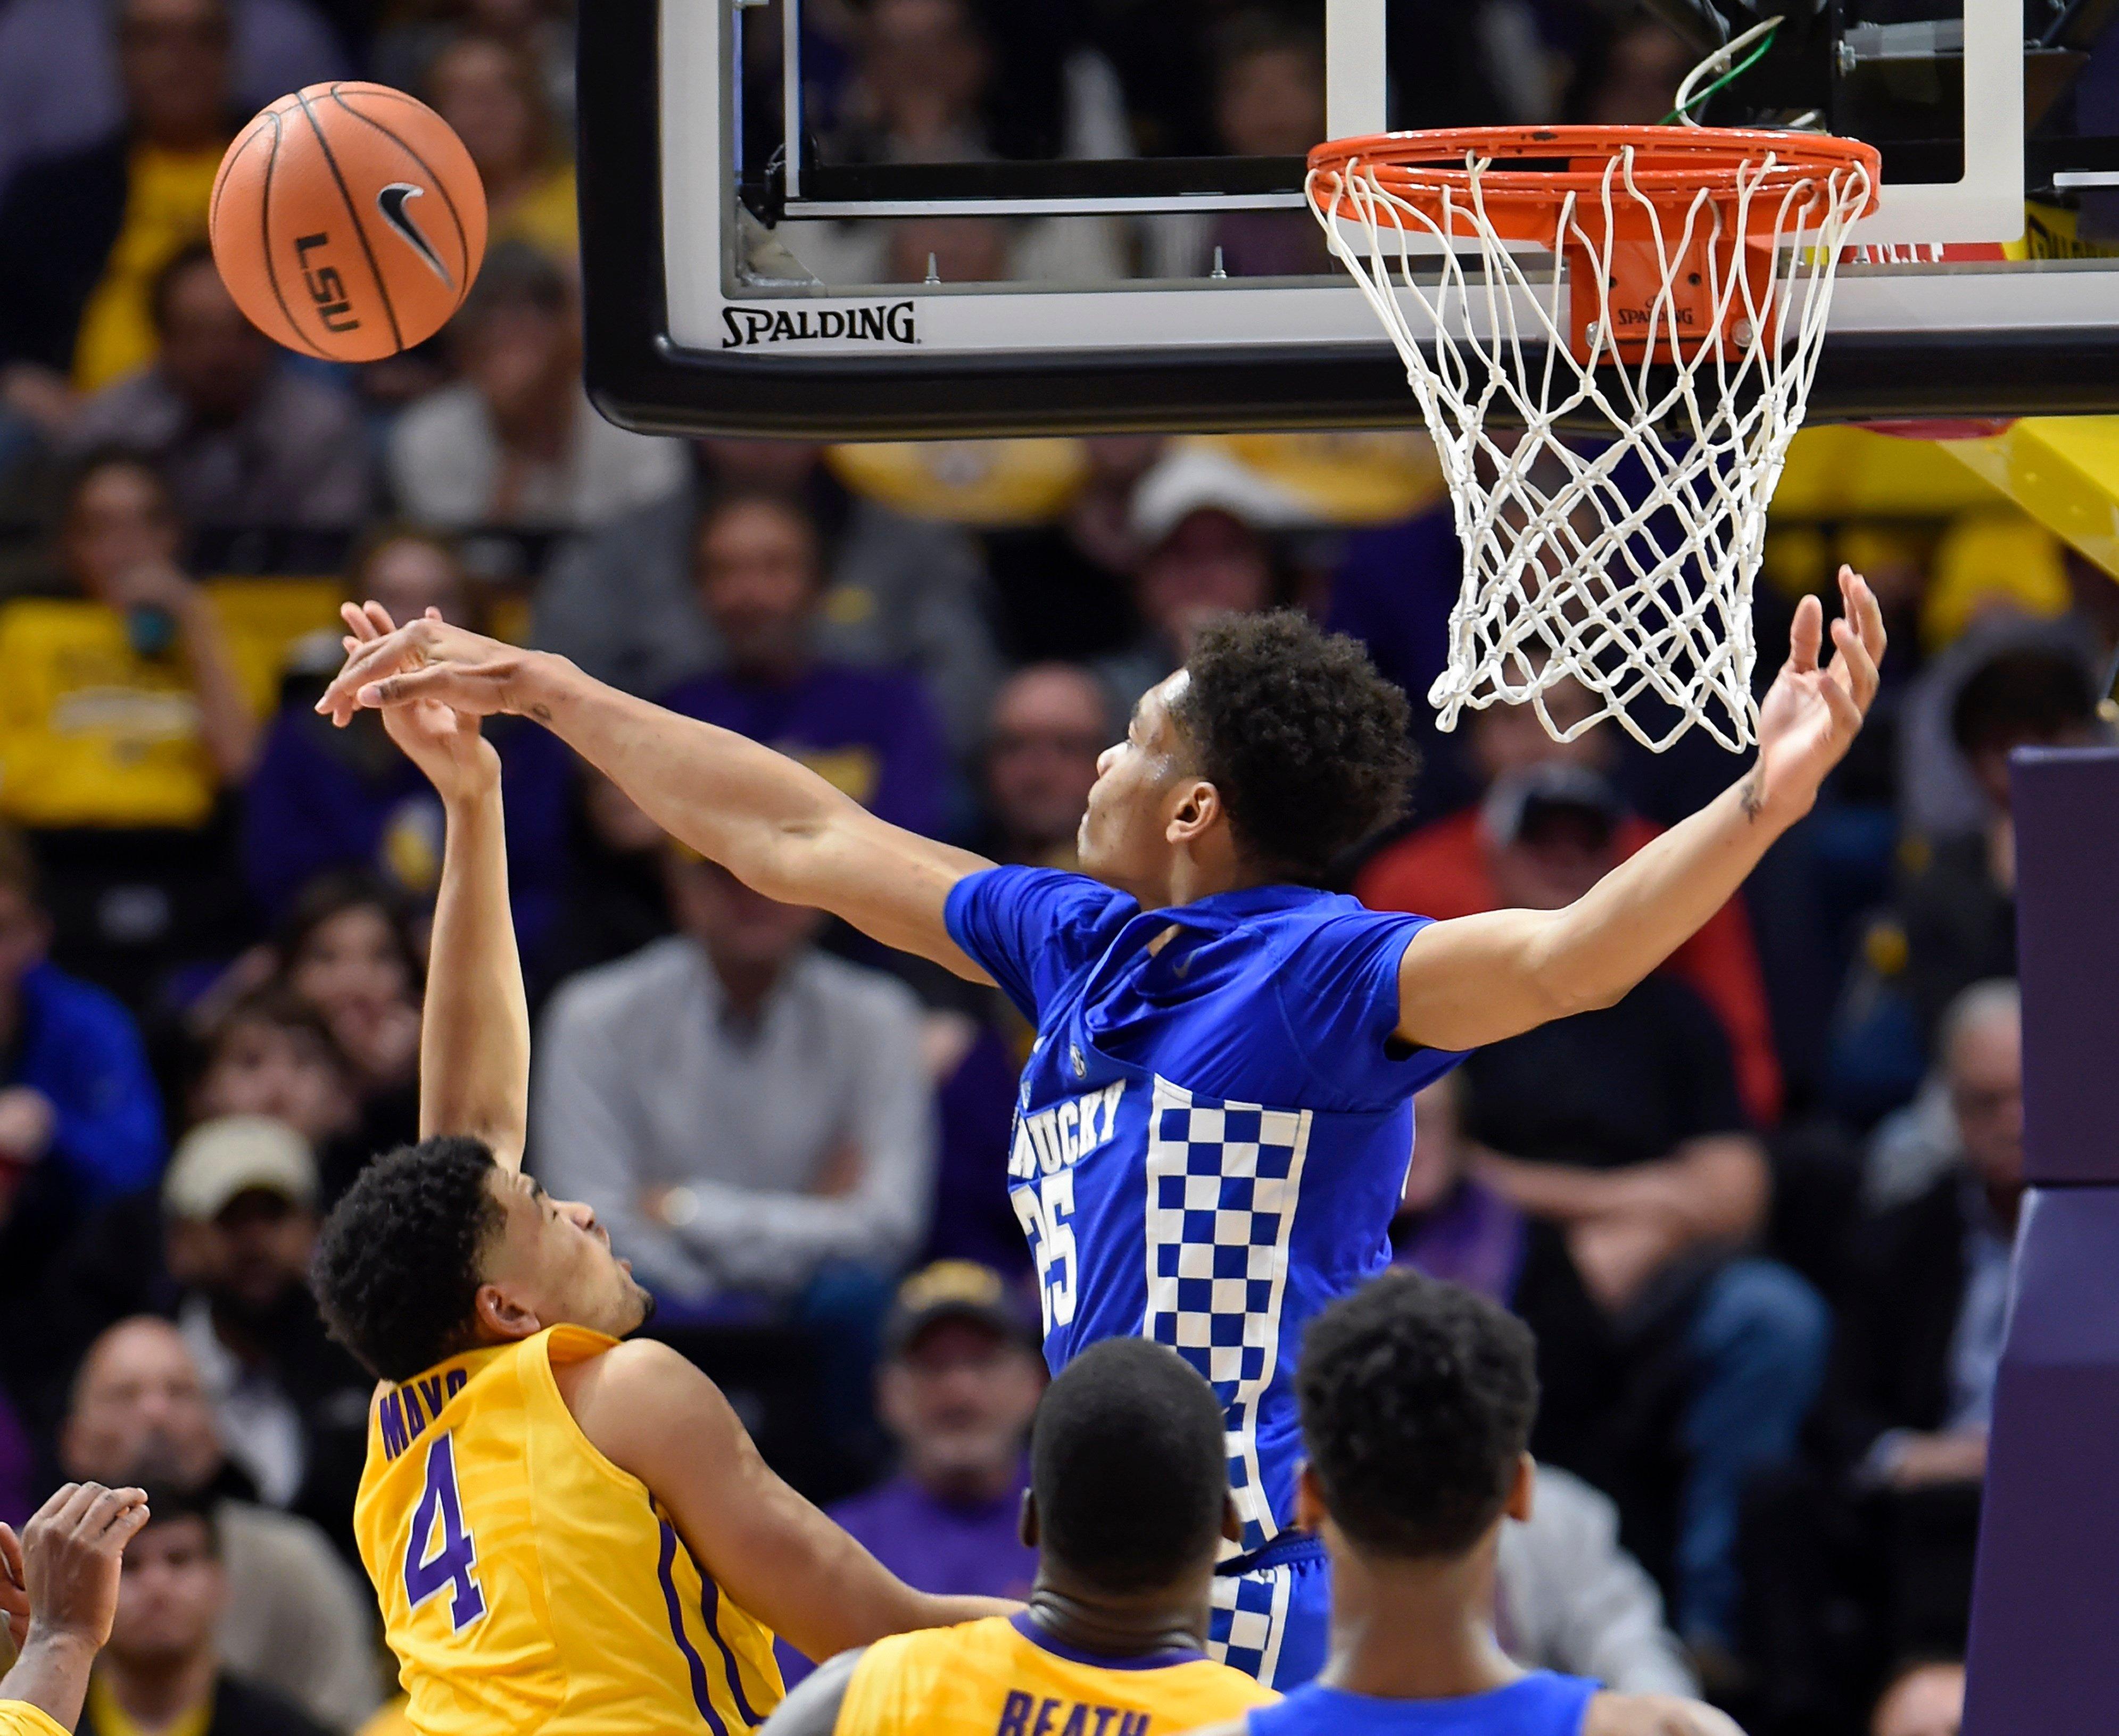 Morris scores 20-plus for 7th straight, Kentucky women win